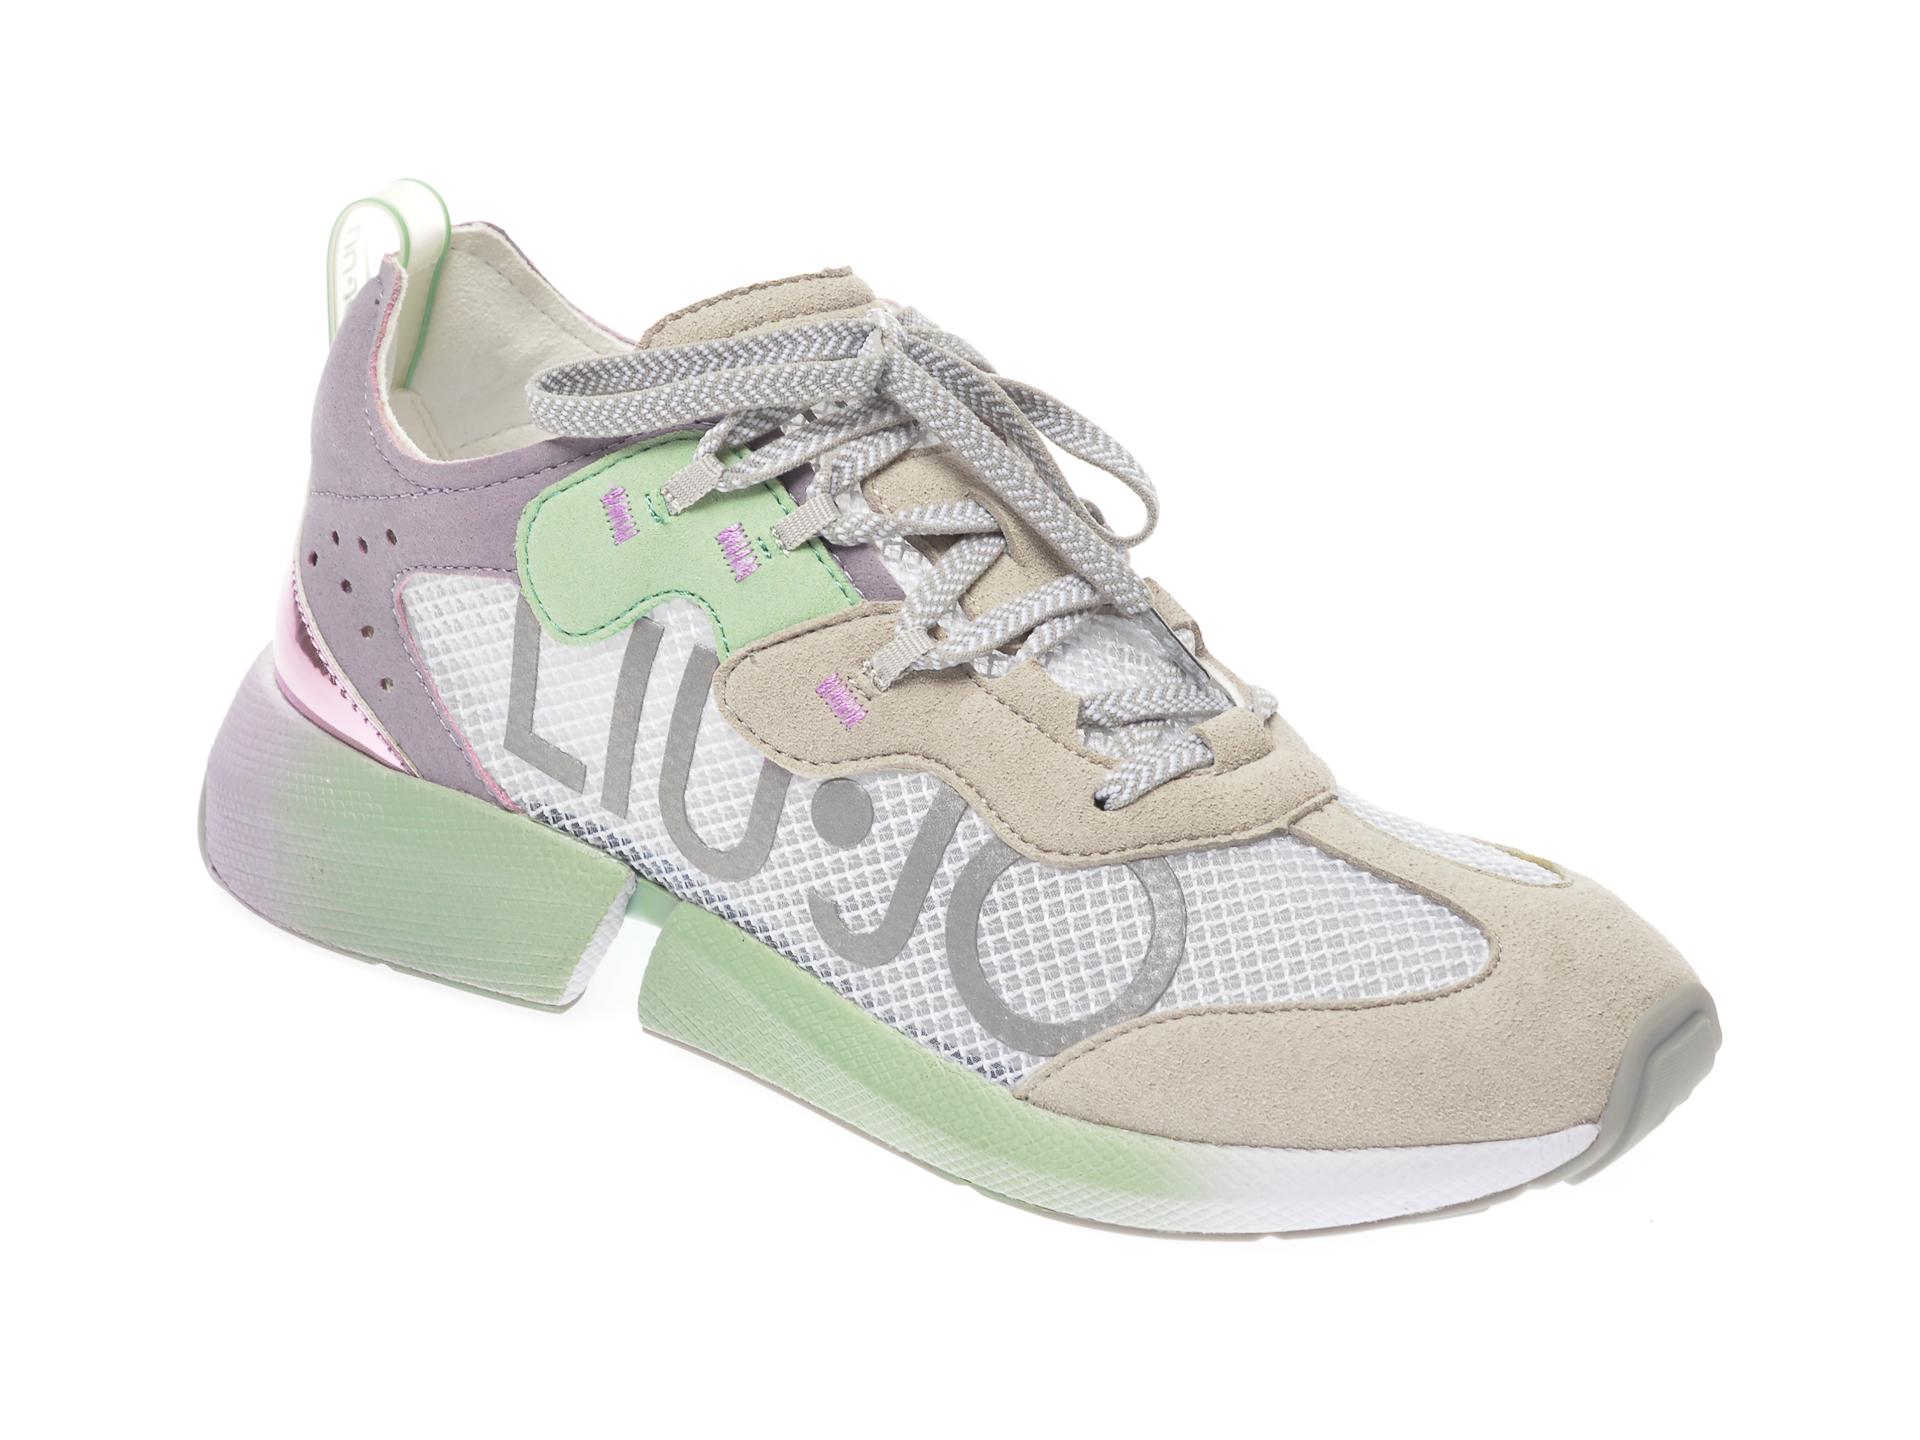 Pantofi sport LIU JO gri, YULIA04, din piele intoarsa imagine